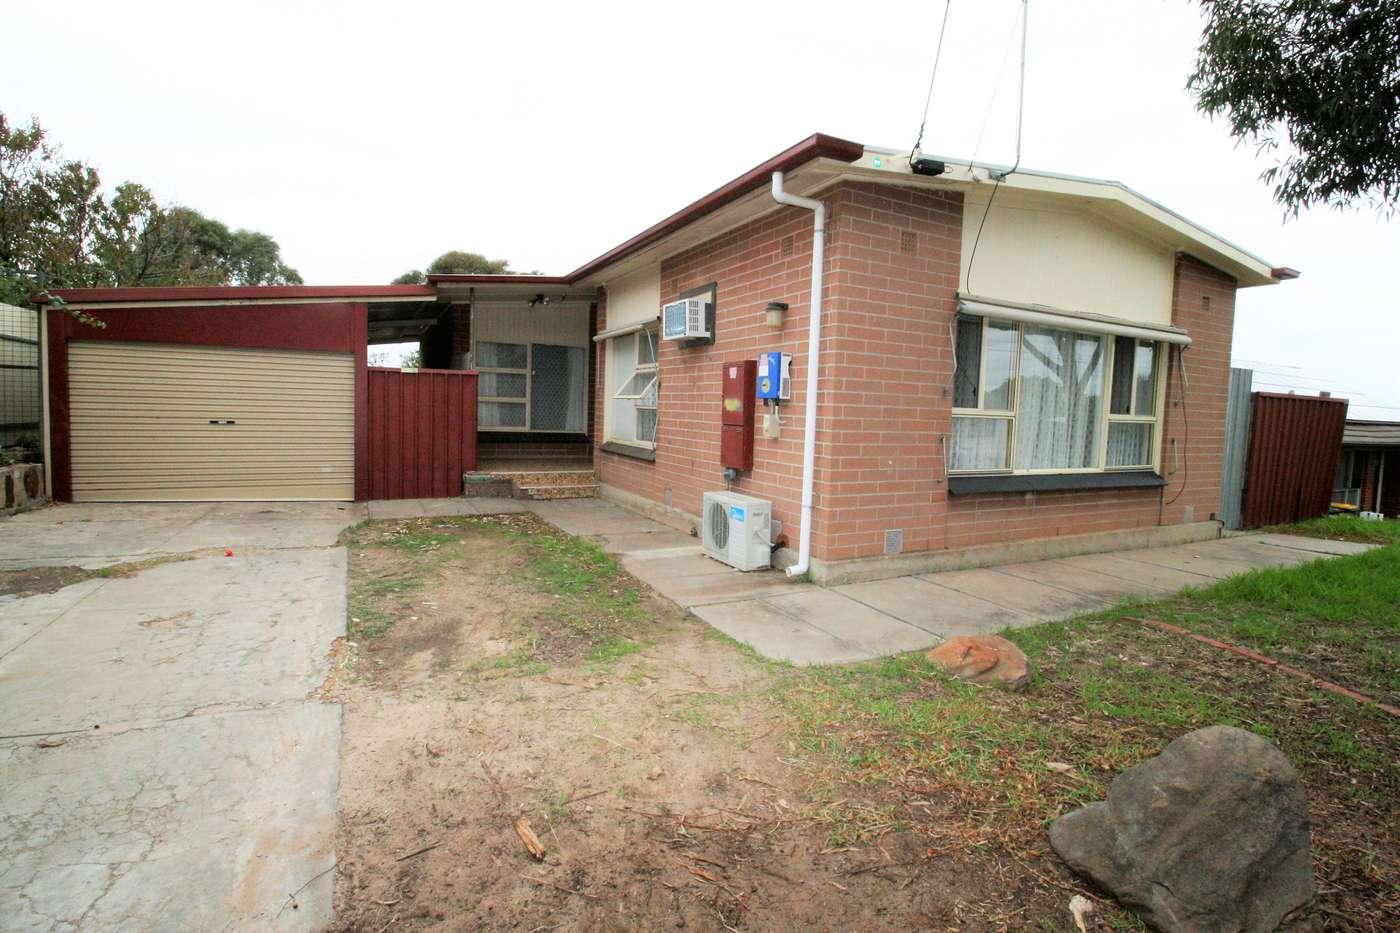 Main view of Homely house listing, 12 Norongo Street, O'sullivan Beach, SA 5166